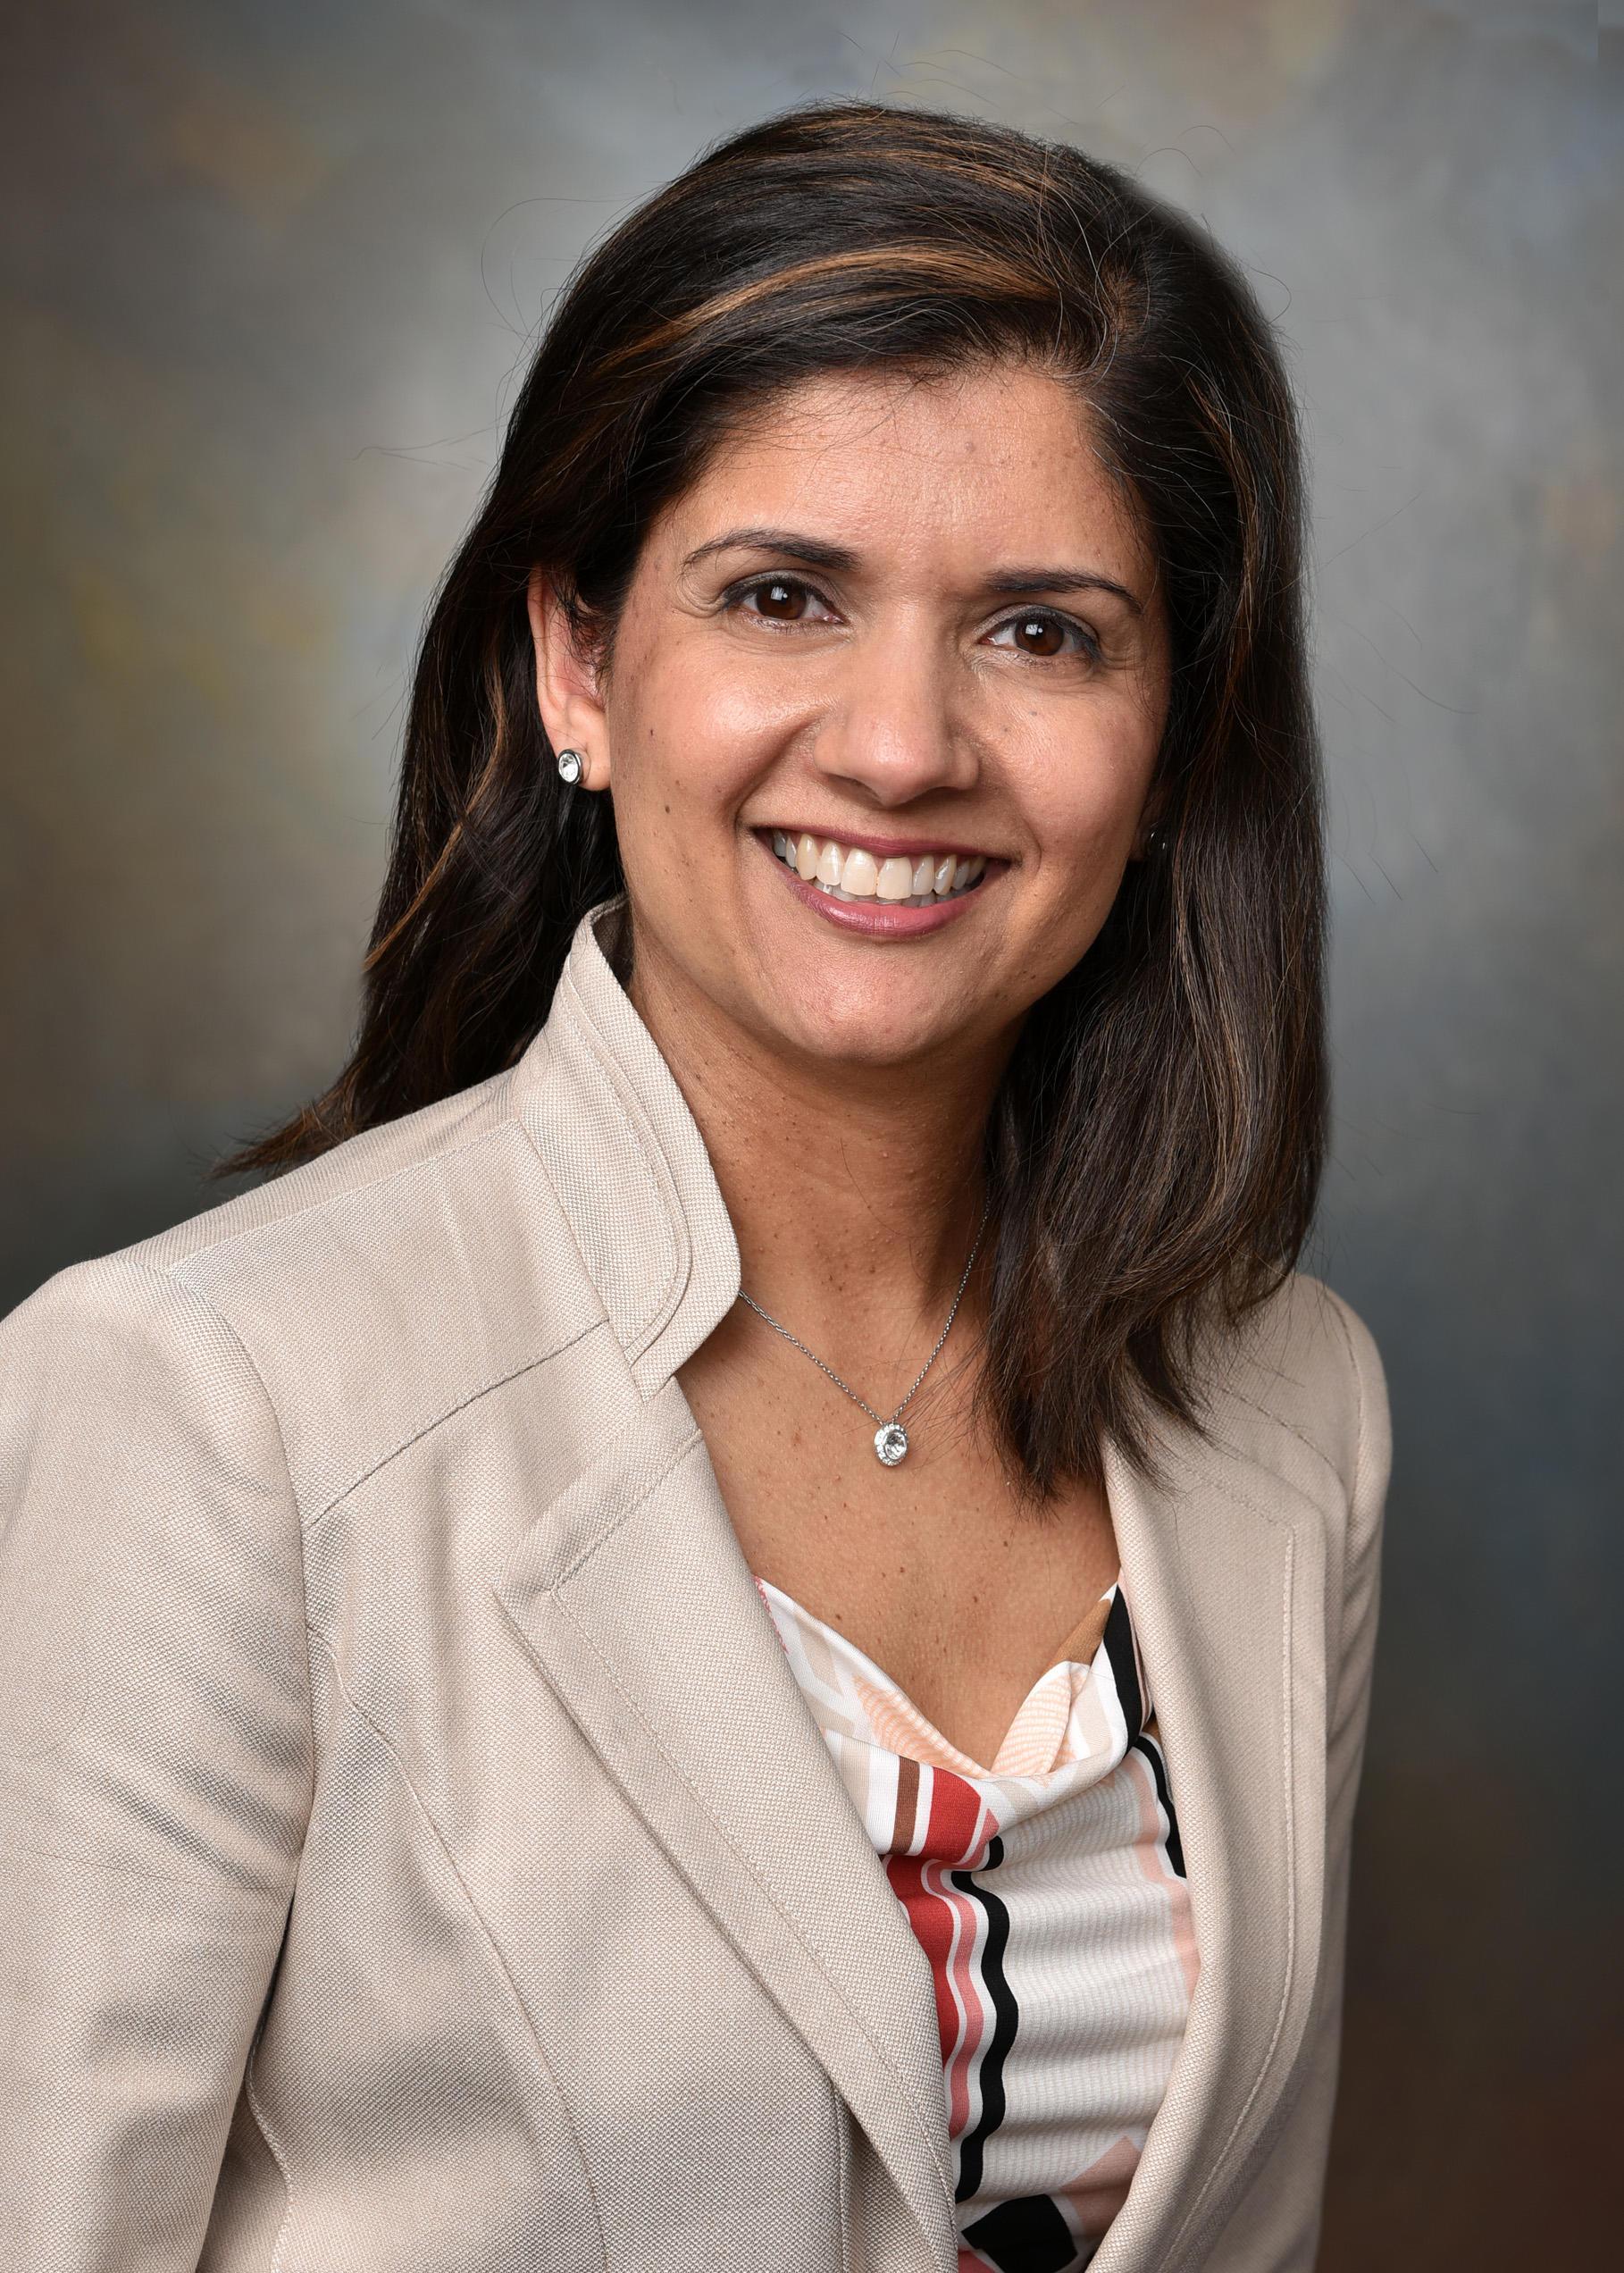 Jyoti Sinha MD